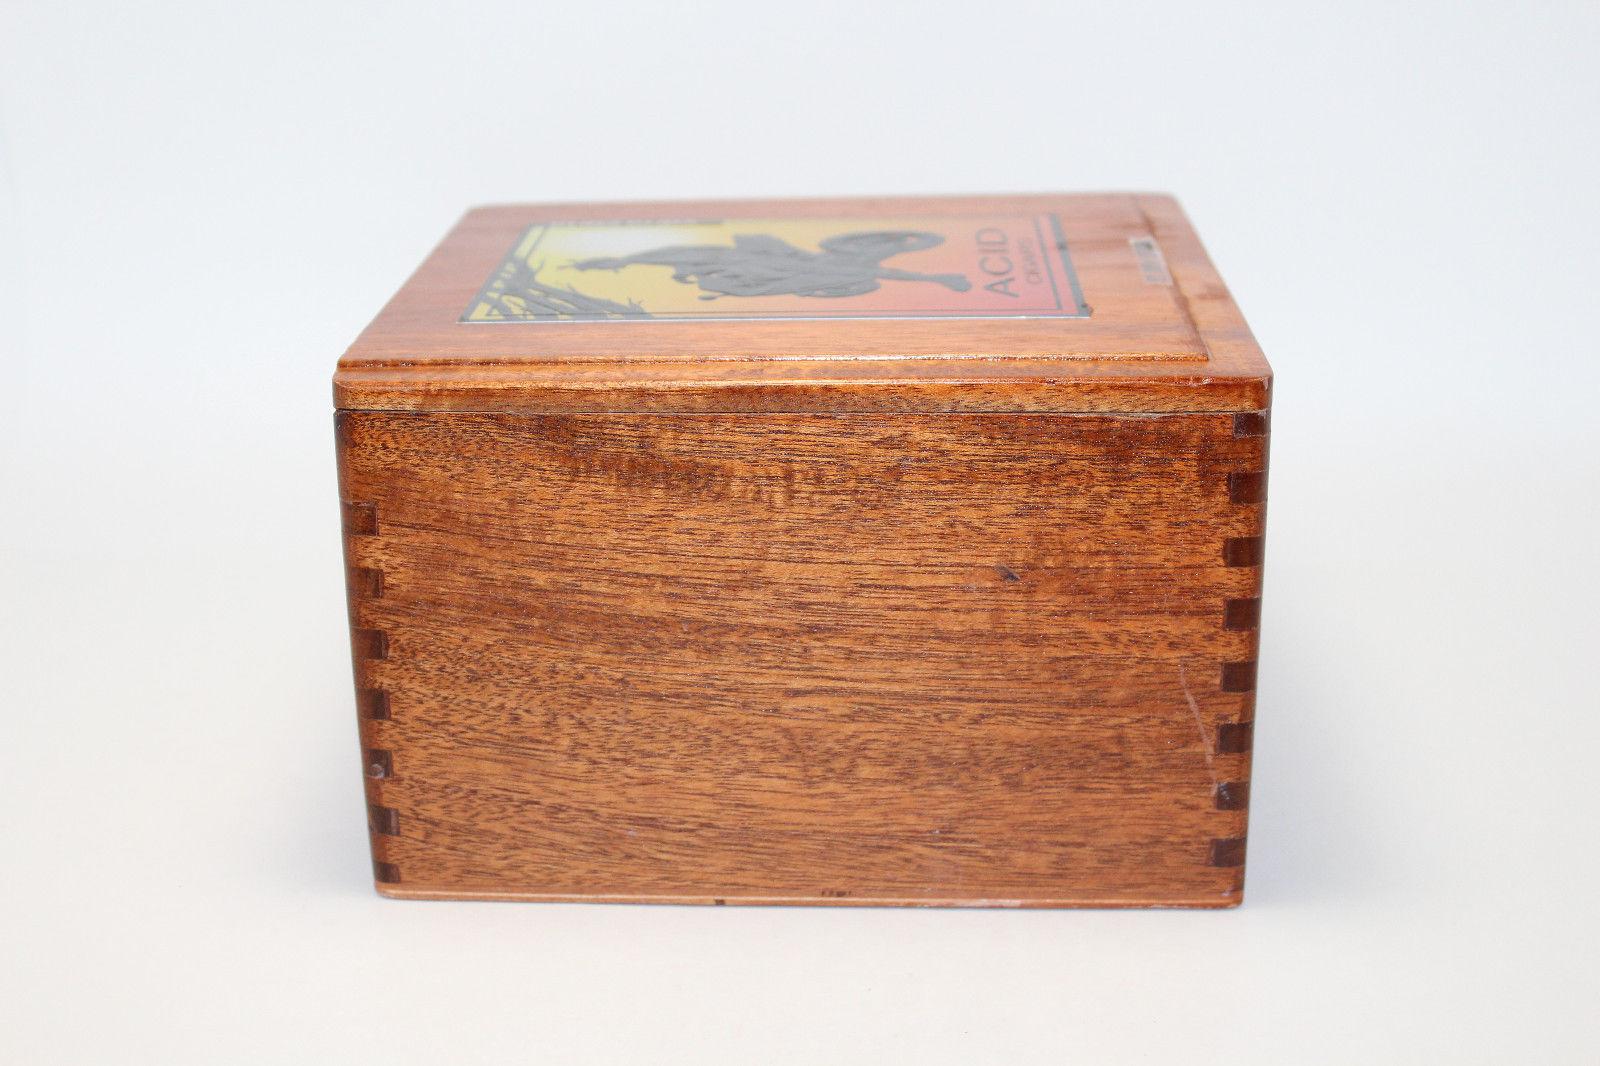 2 Arturo Fuente wood empty cigar craft jewerly box lot